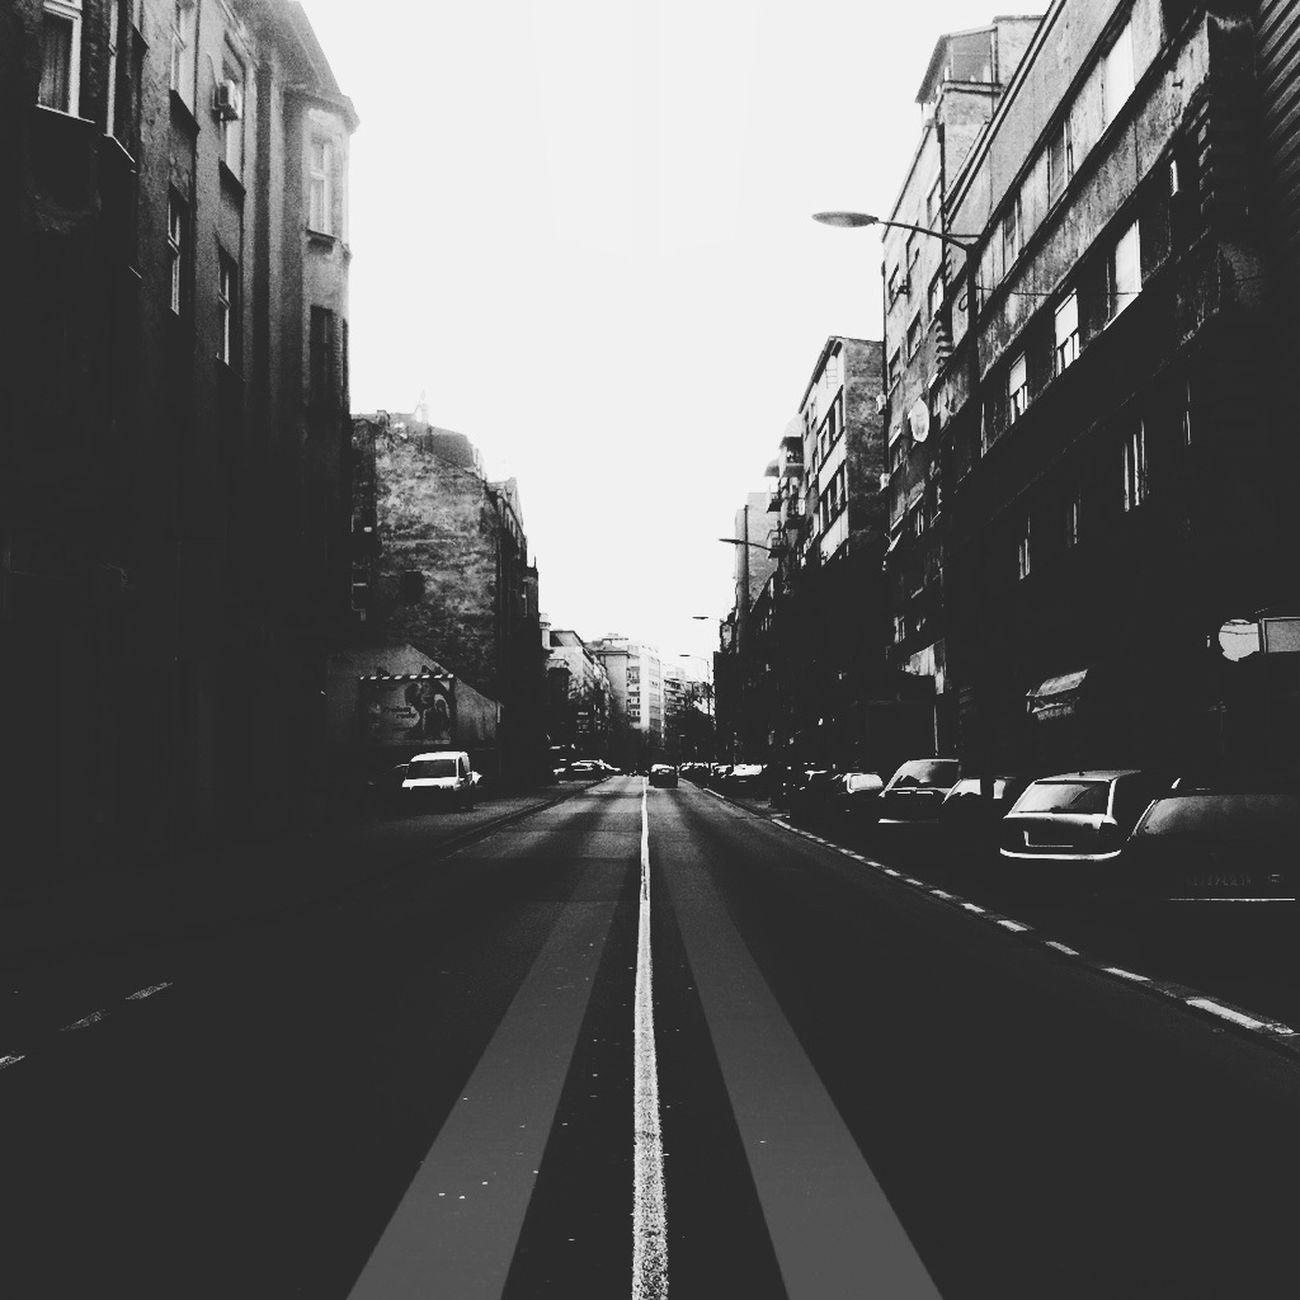 Streetphotography Blackandwhite Streetphoto_bw AMPt - Vanishing Point